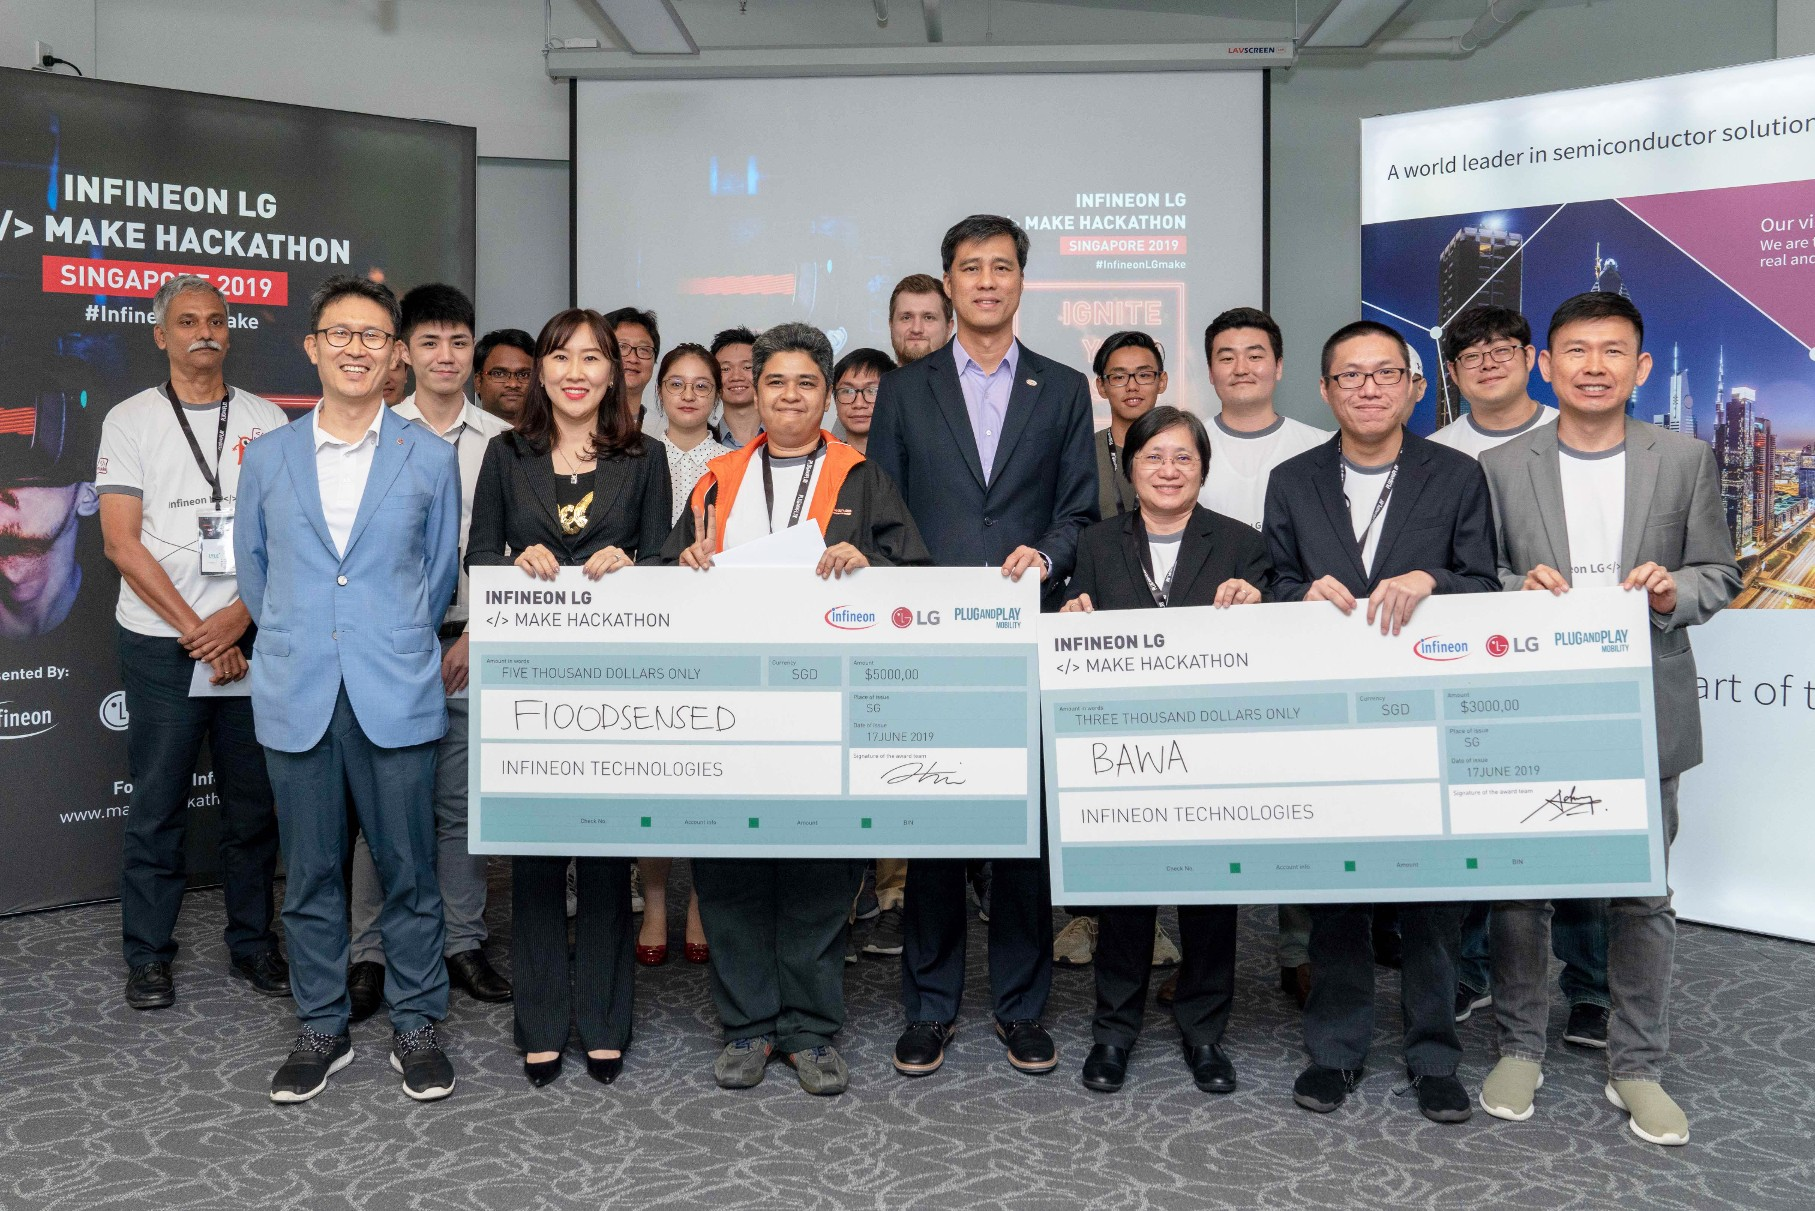 Infineon LG Make Hackathon